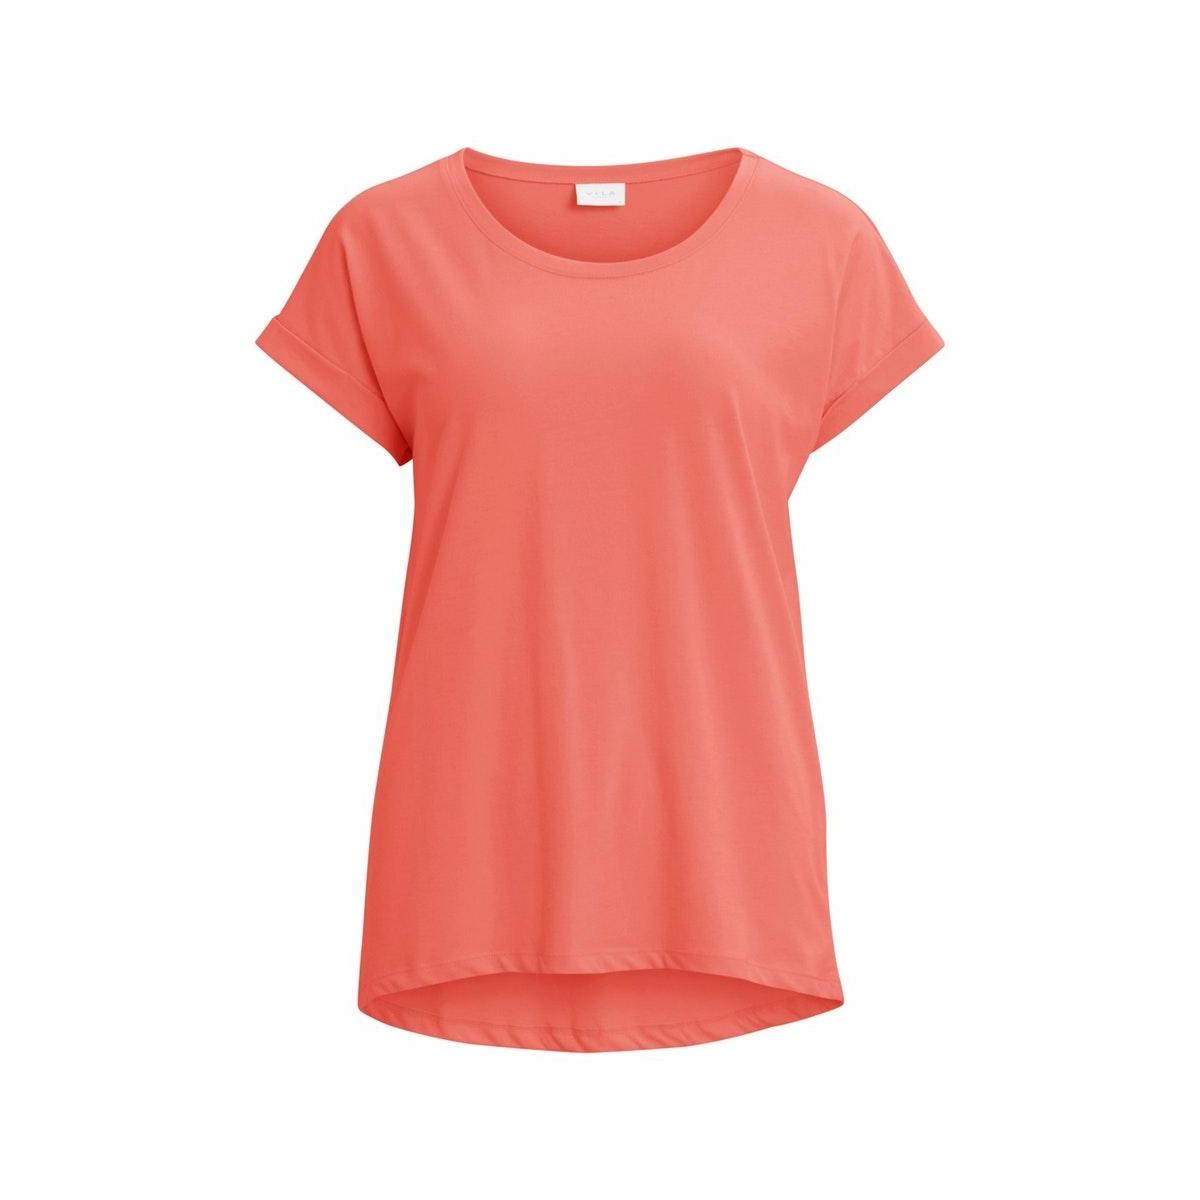 vidreamers pure t-shirt-noos 14025668 vila t-shirt dusty cedar